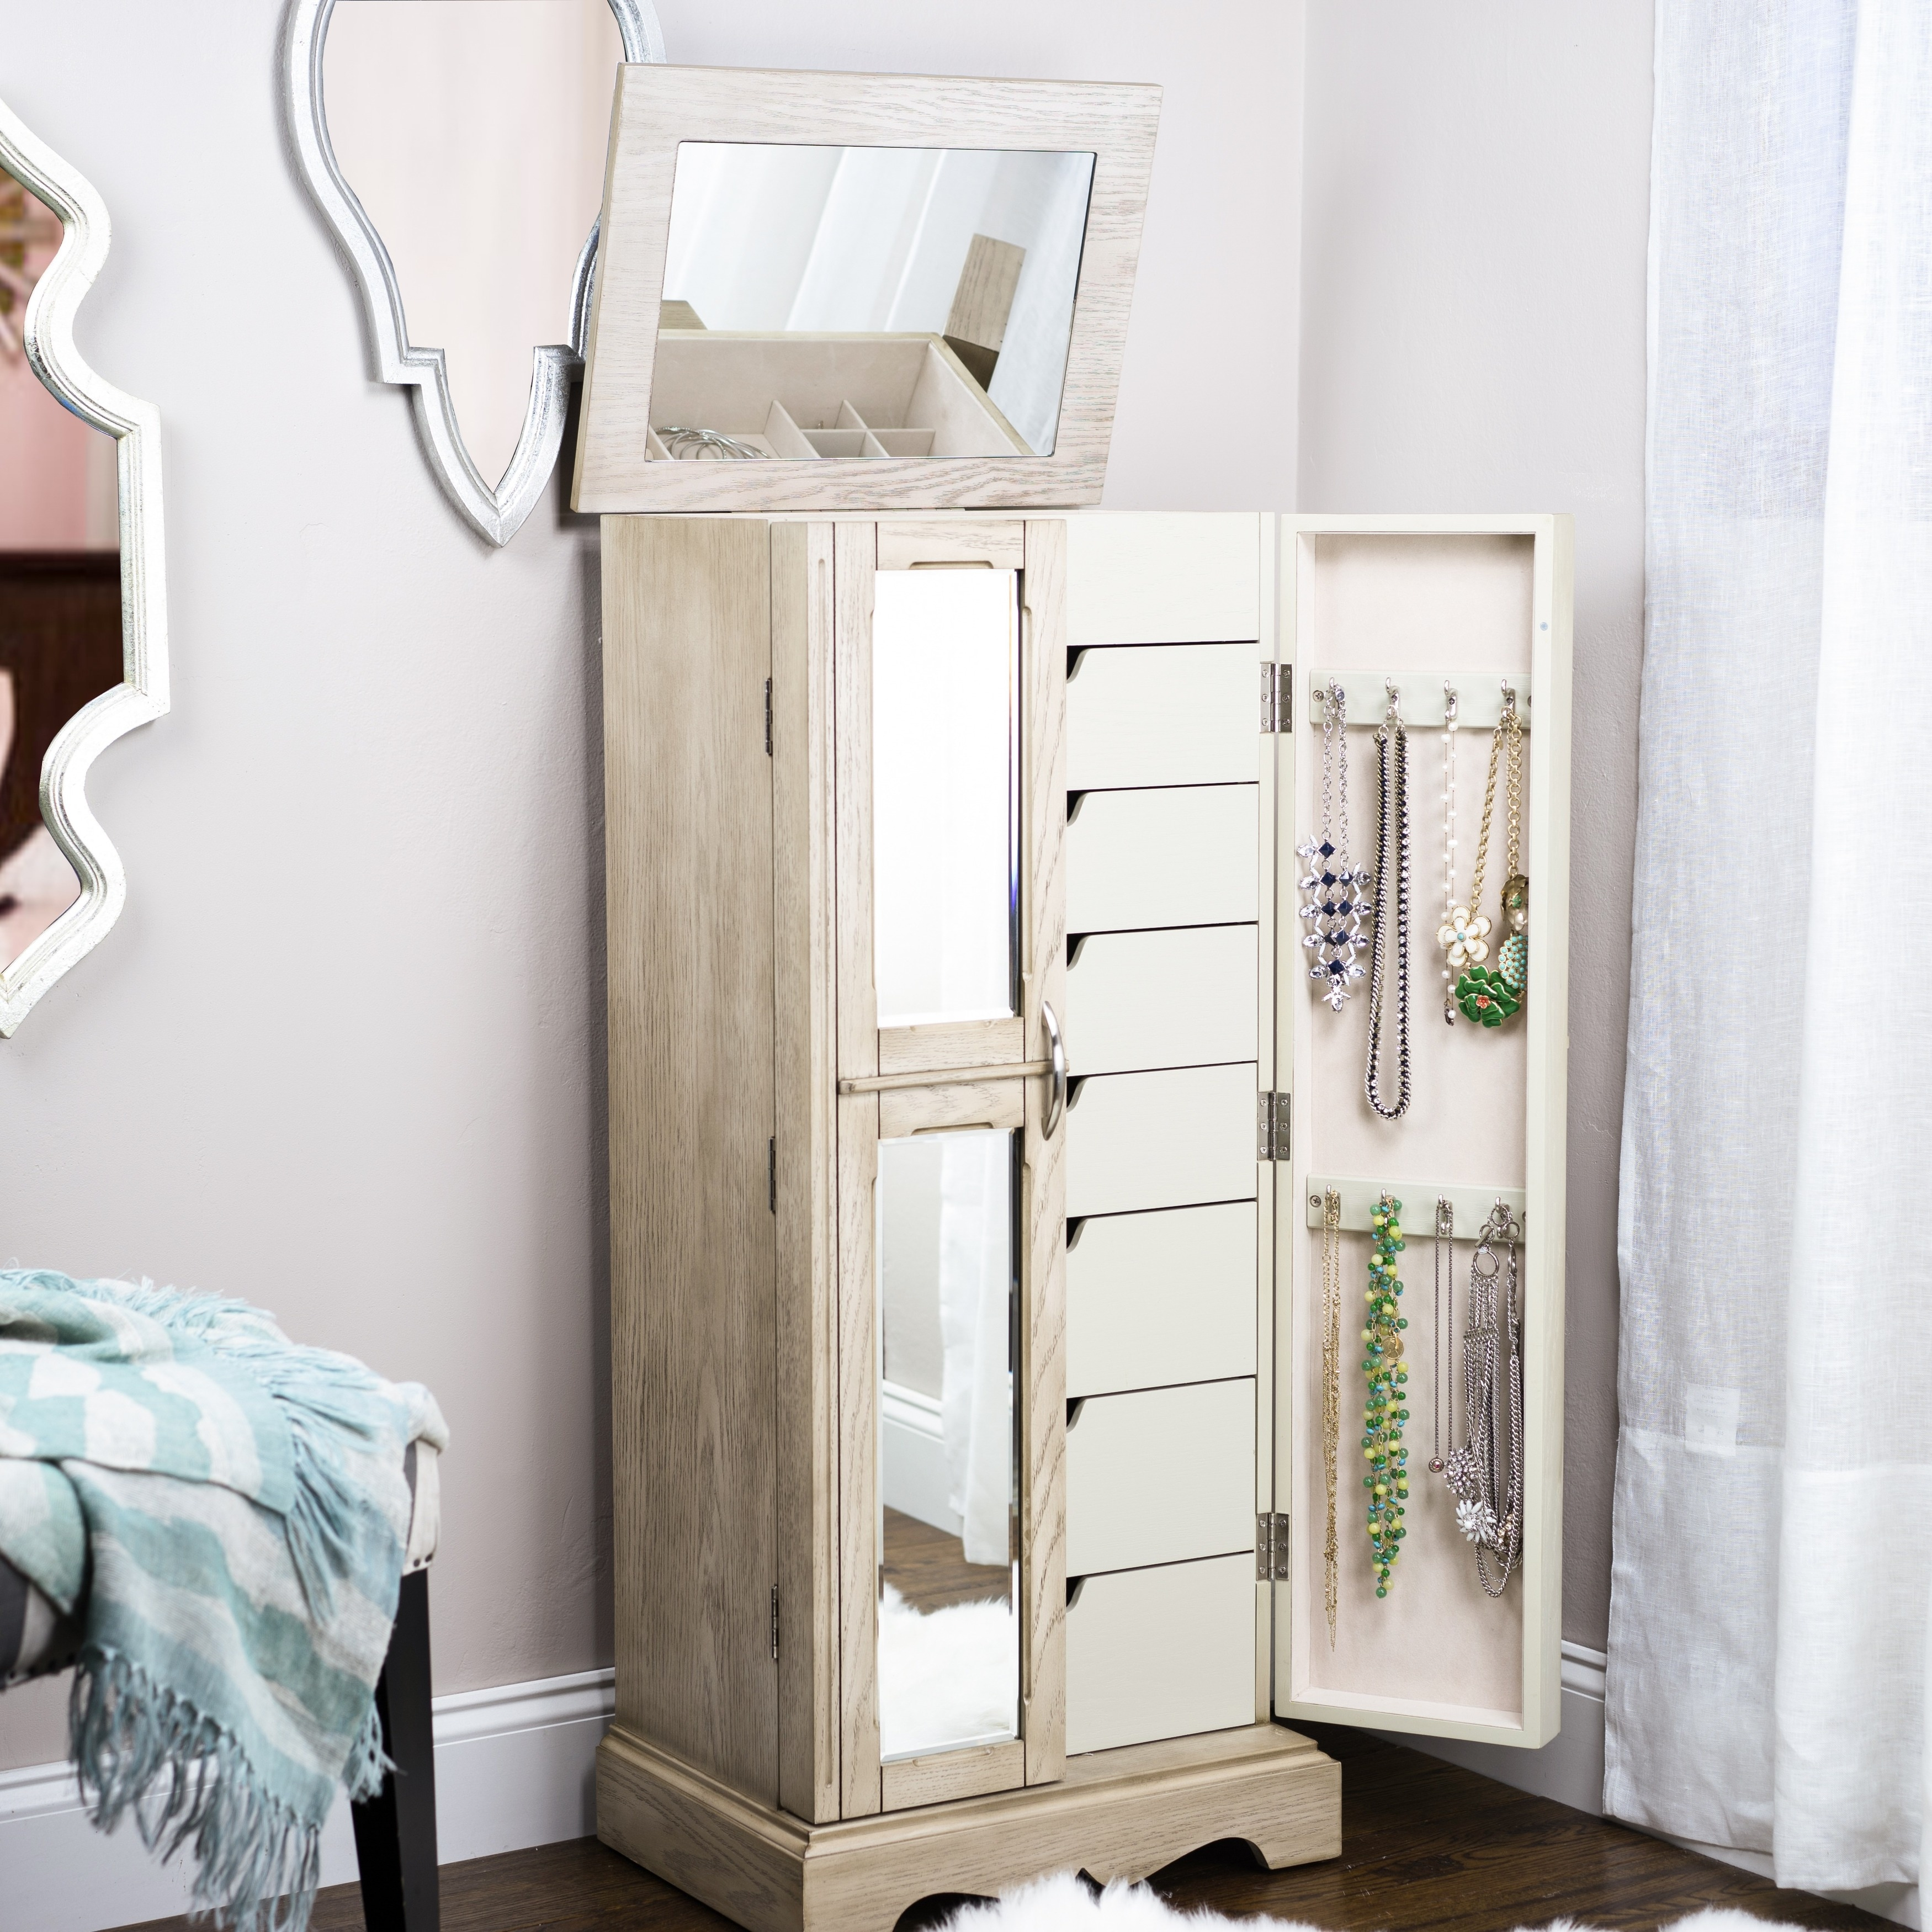 buy in wardrobes floor girl wardrobe armoire mirror jewelry girls pearl white mirrored